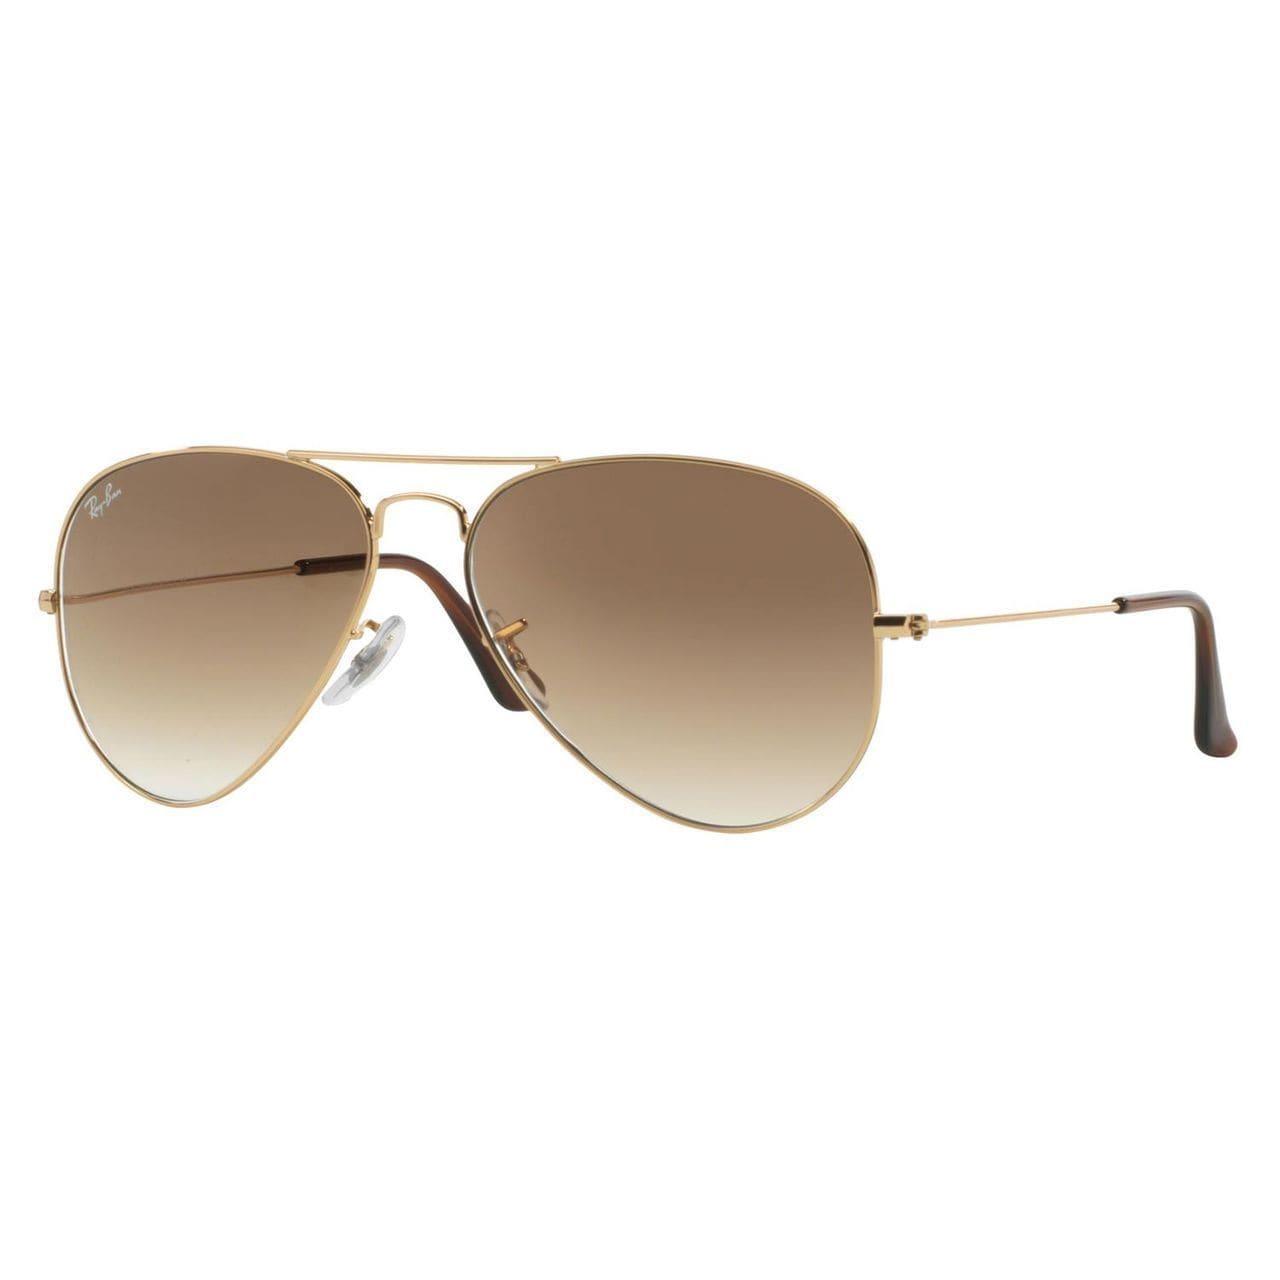 6ede68f3810 Ray-Ban Aviator  RB3025  Unisex Gold Frame Light Brown Gradient Lens  Sunglasses